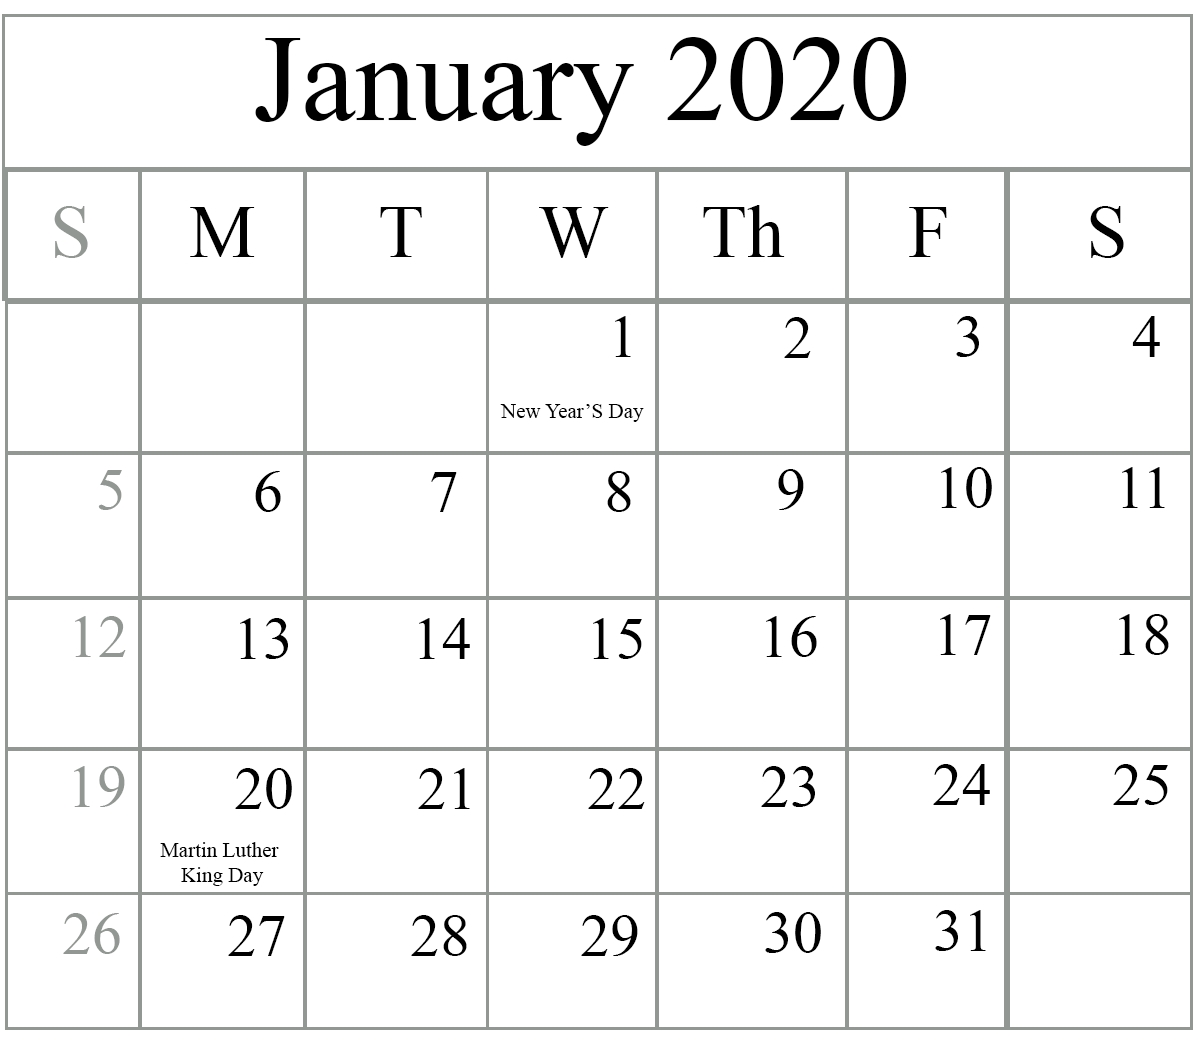 Free Blank January 2020 Calendar Printable In Pdf, Word-January 2020 Calendar Editable